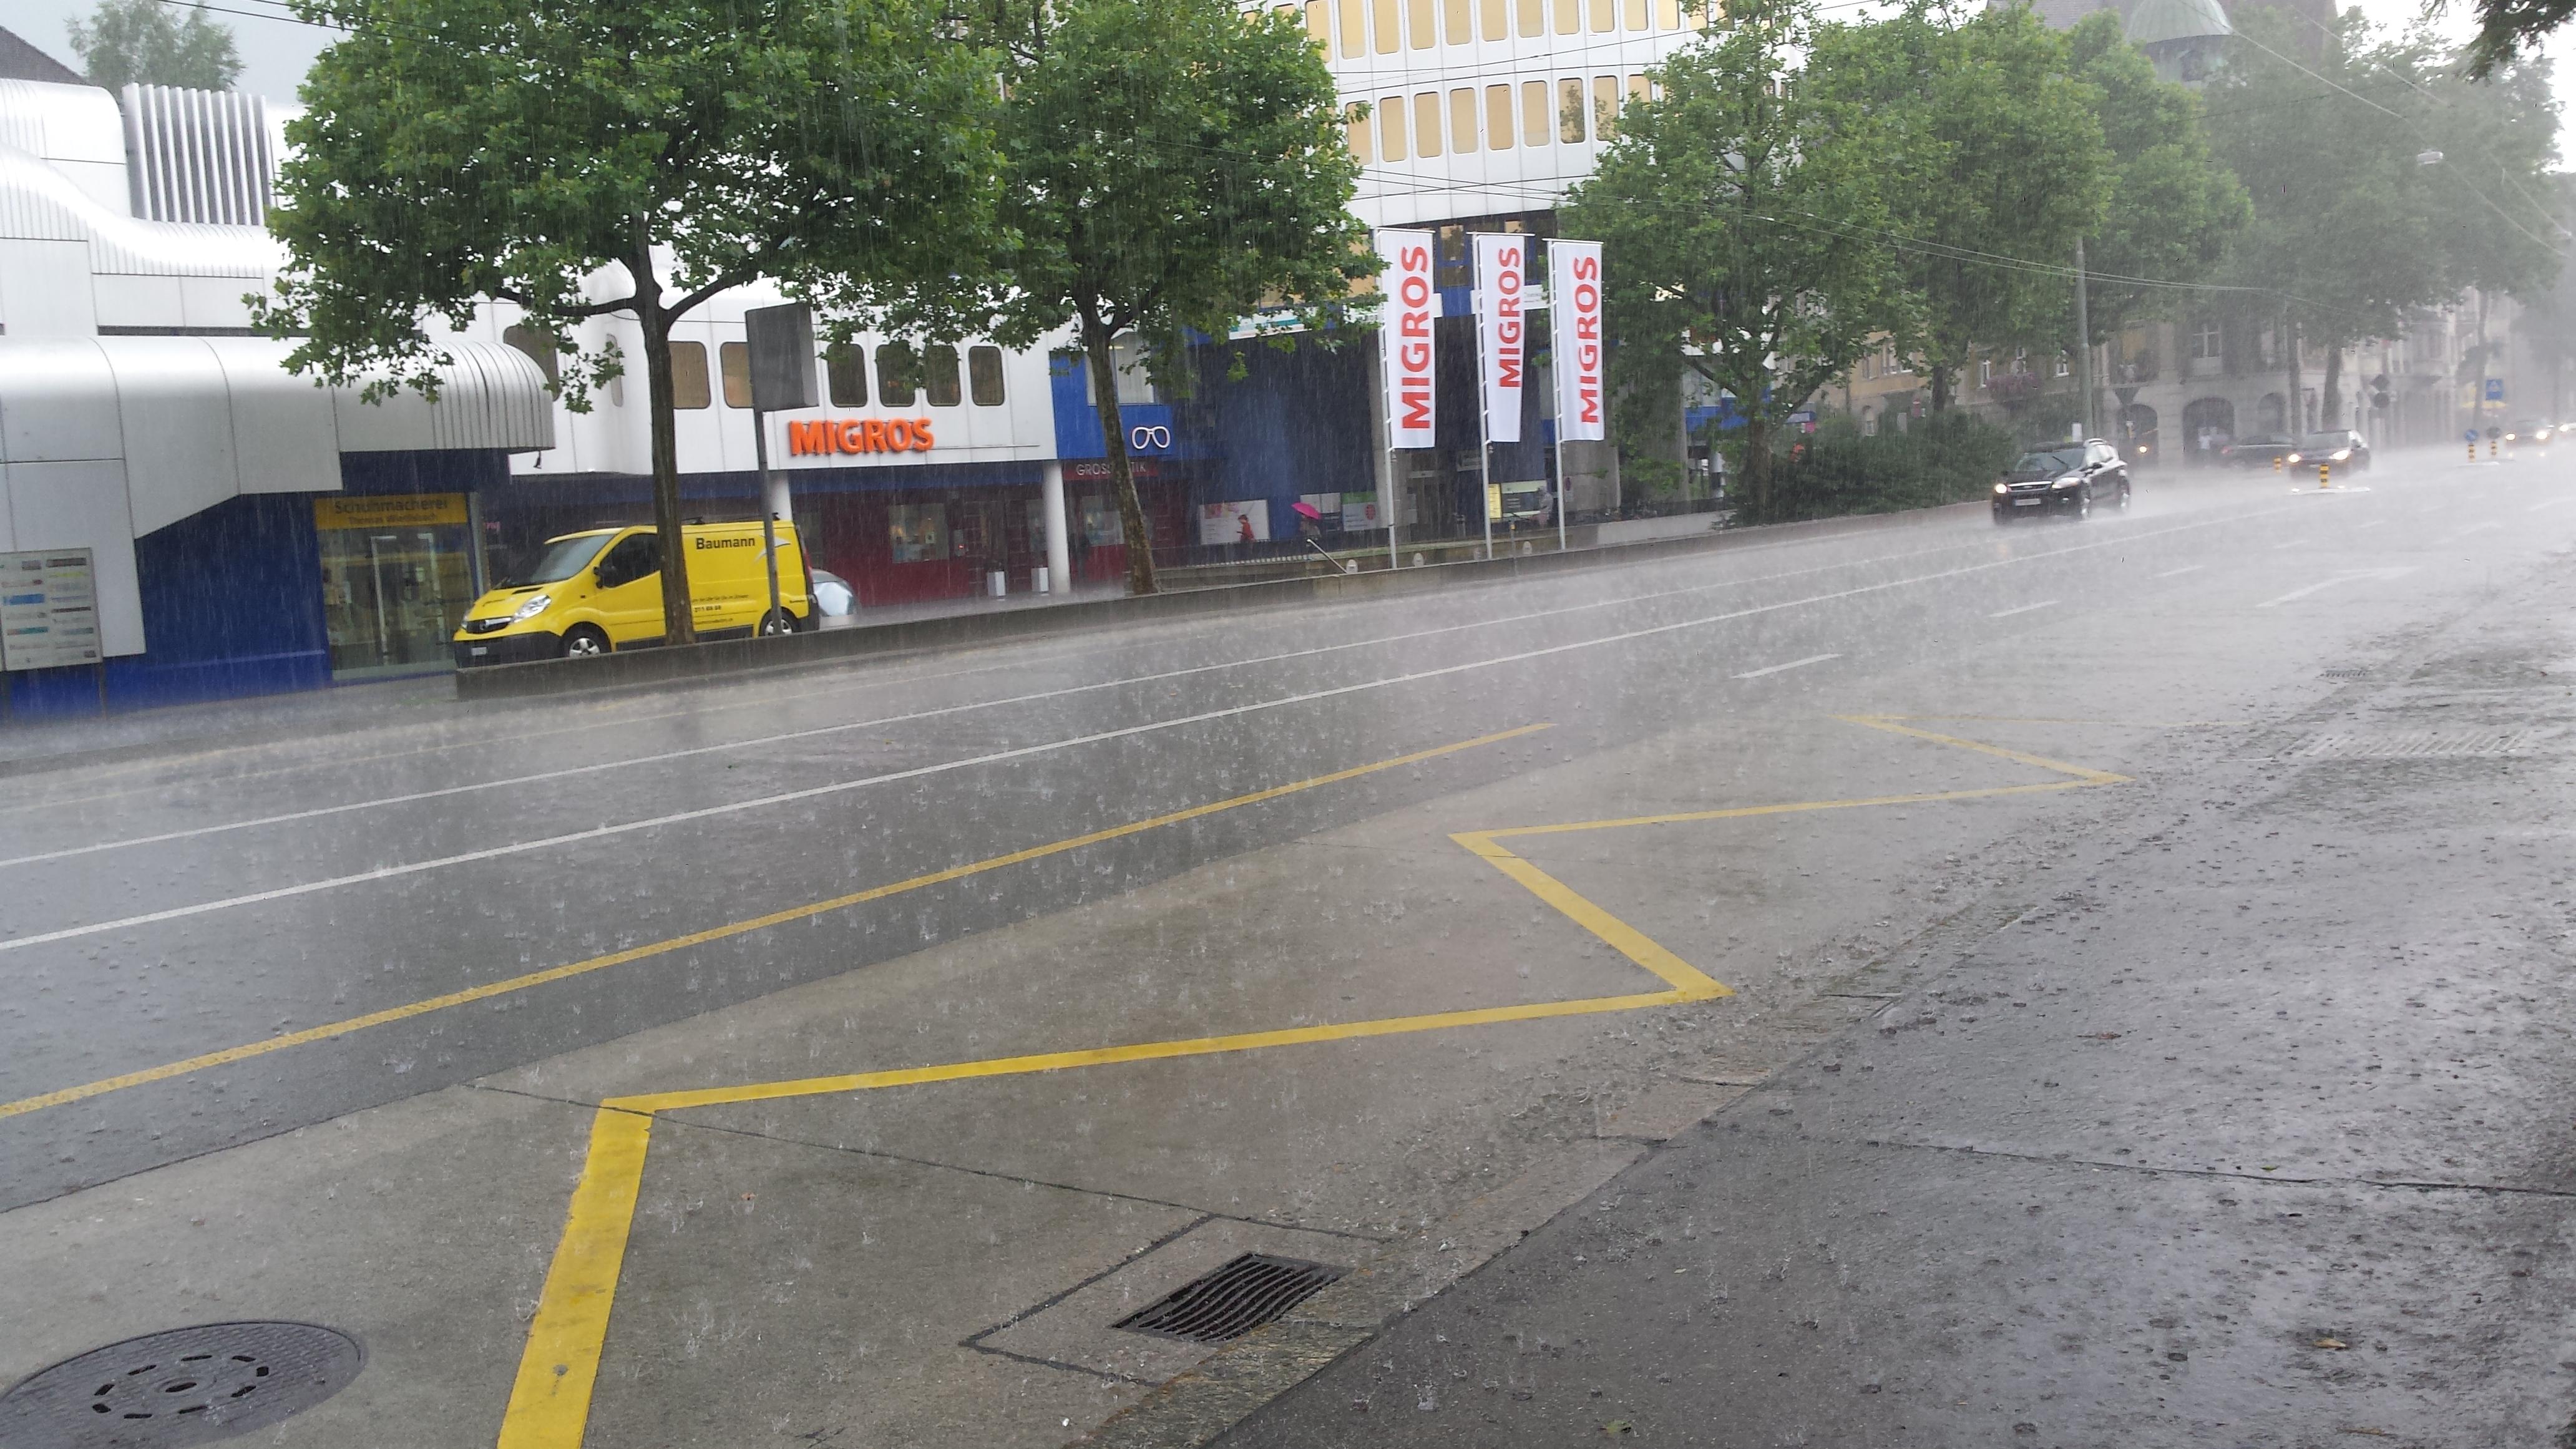 Platzregen St.Gallen